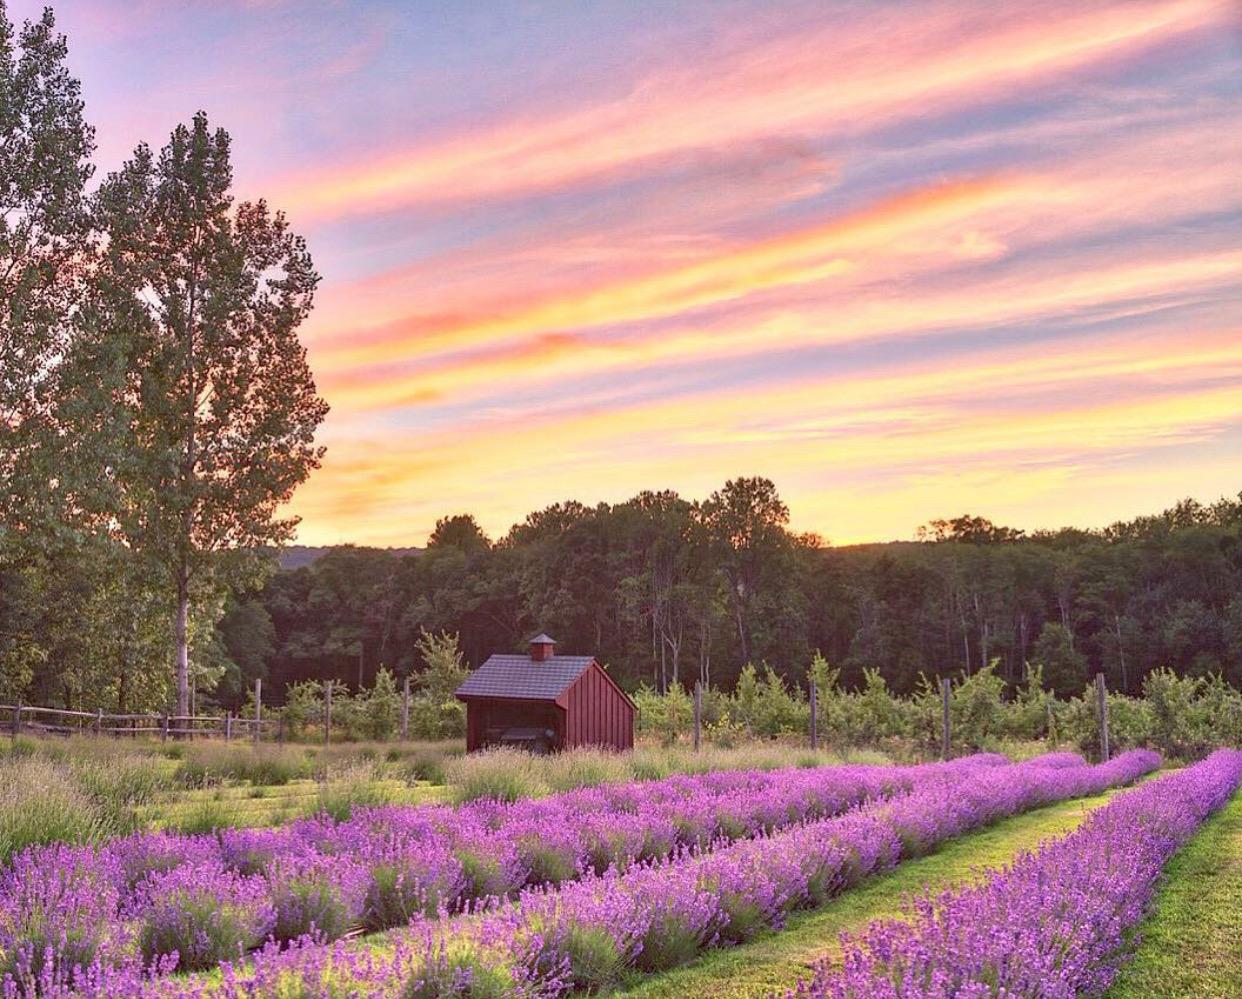 nj mom lavender farm 6 Relaxing Lavender Farms in New Jersey lavender fields nj rachelellentuck_photography